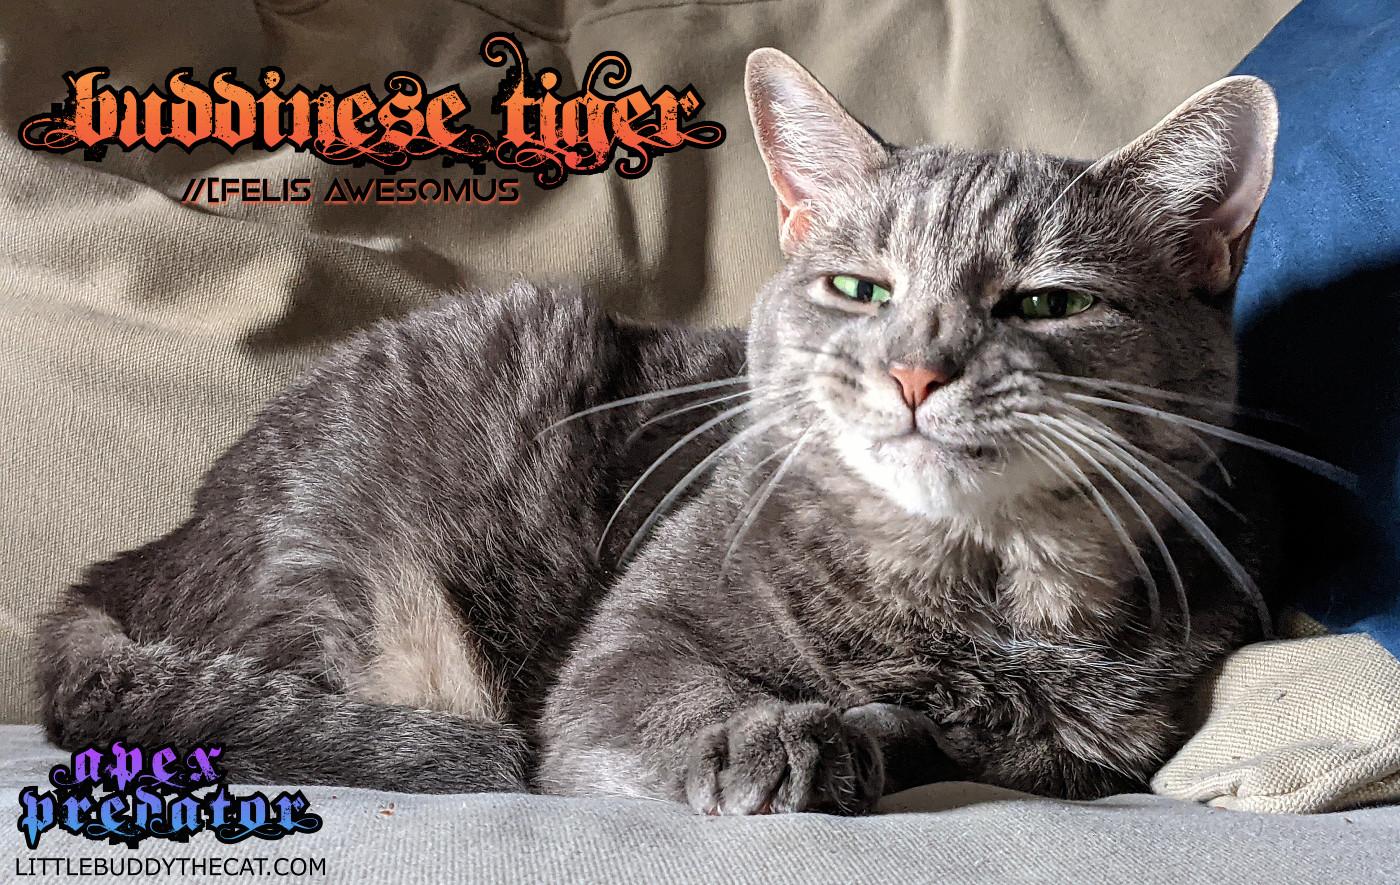 Buddinese Tiger